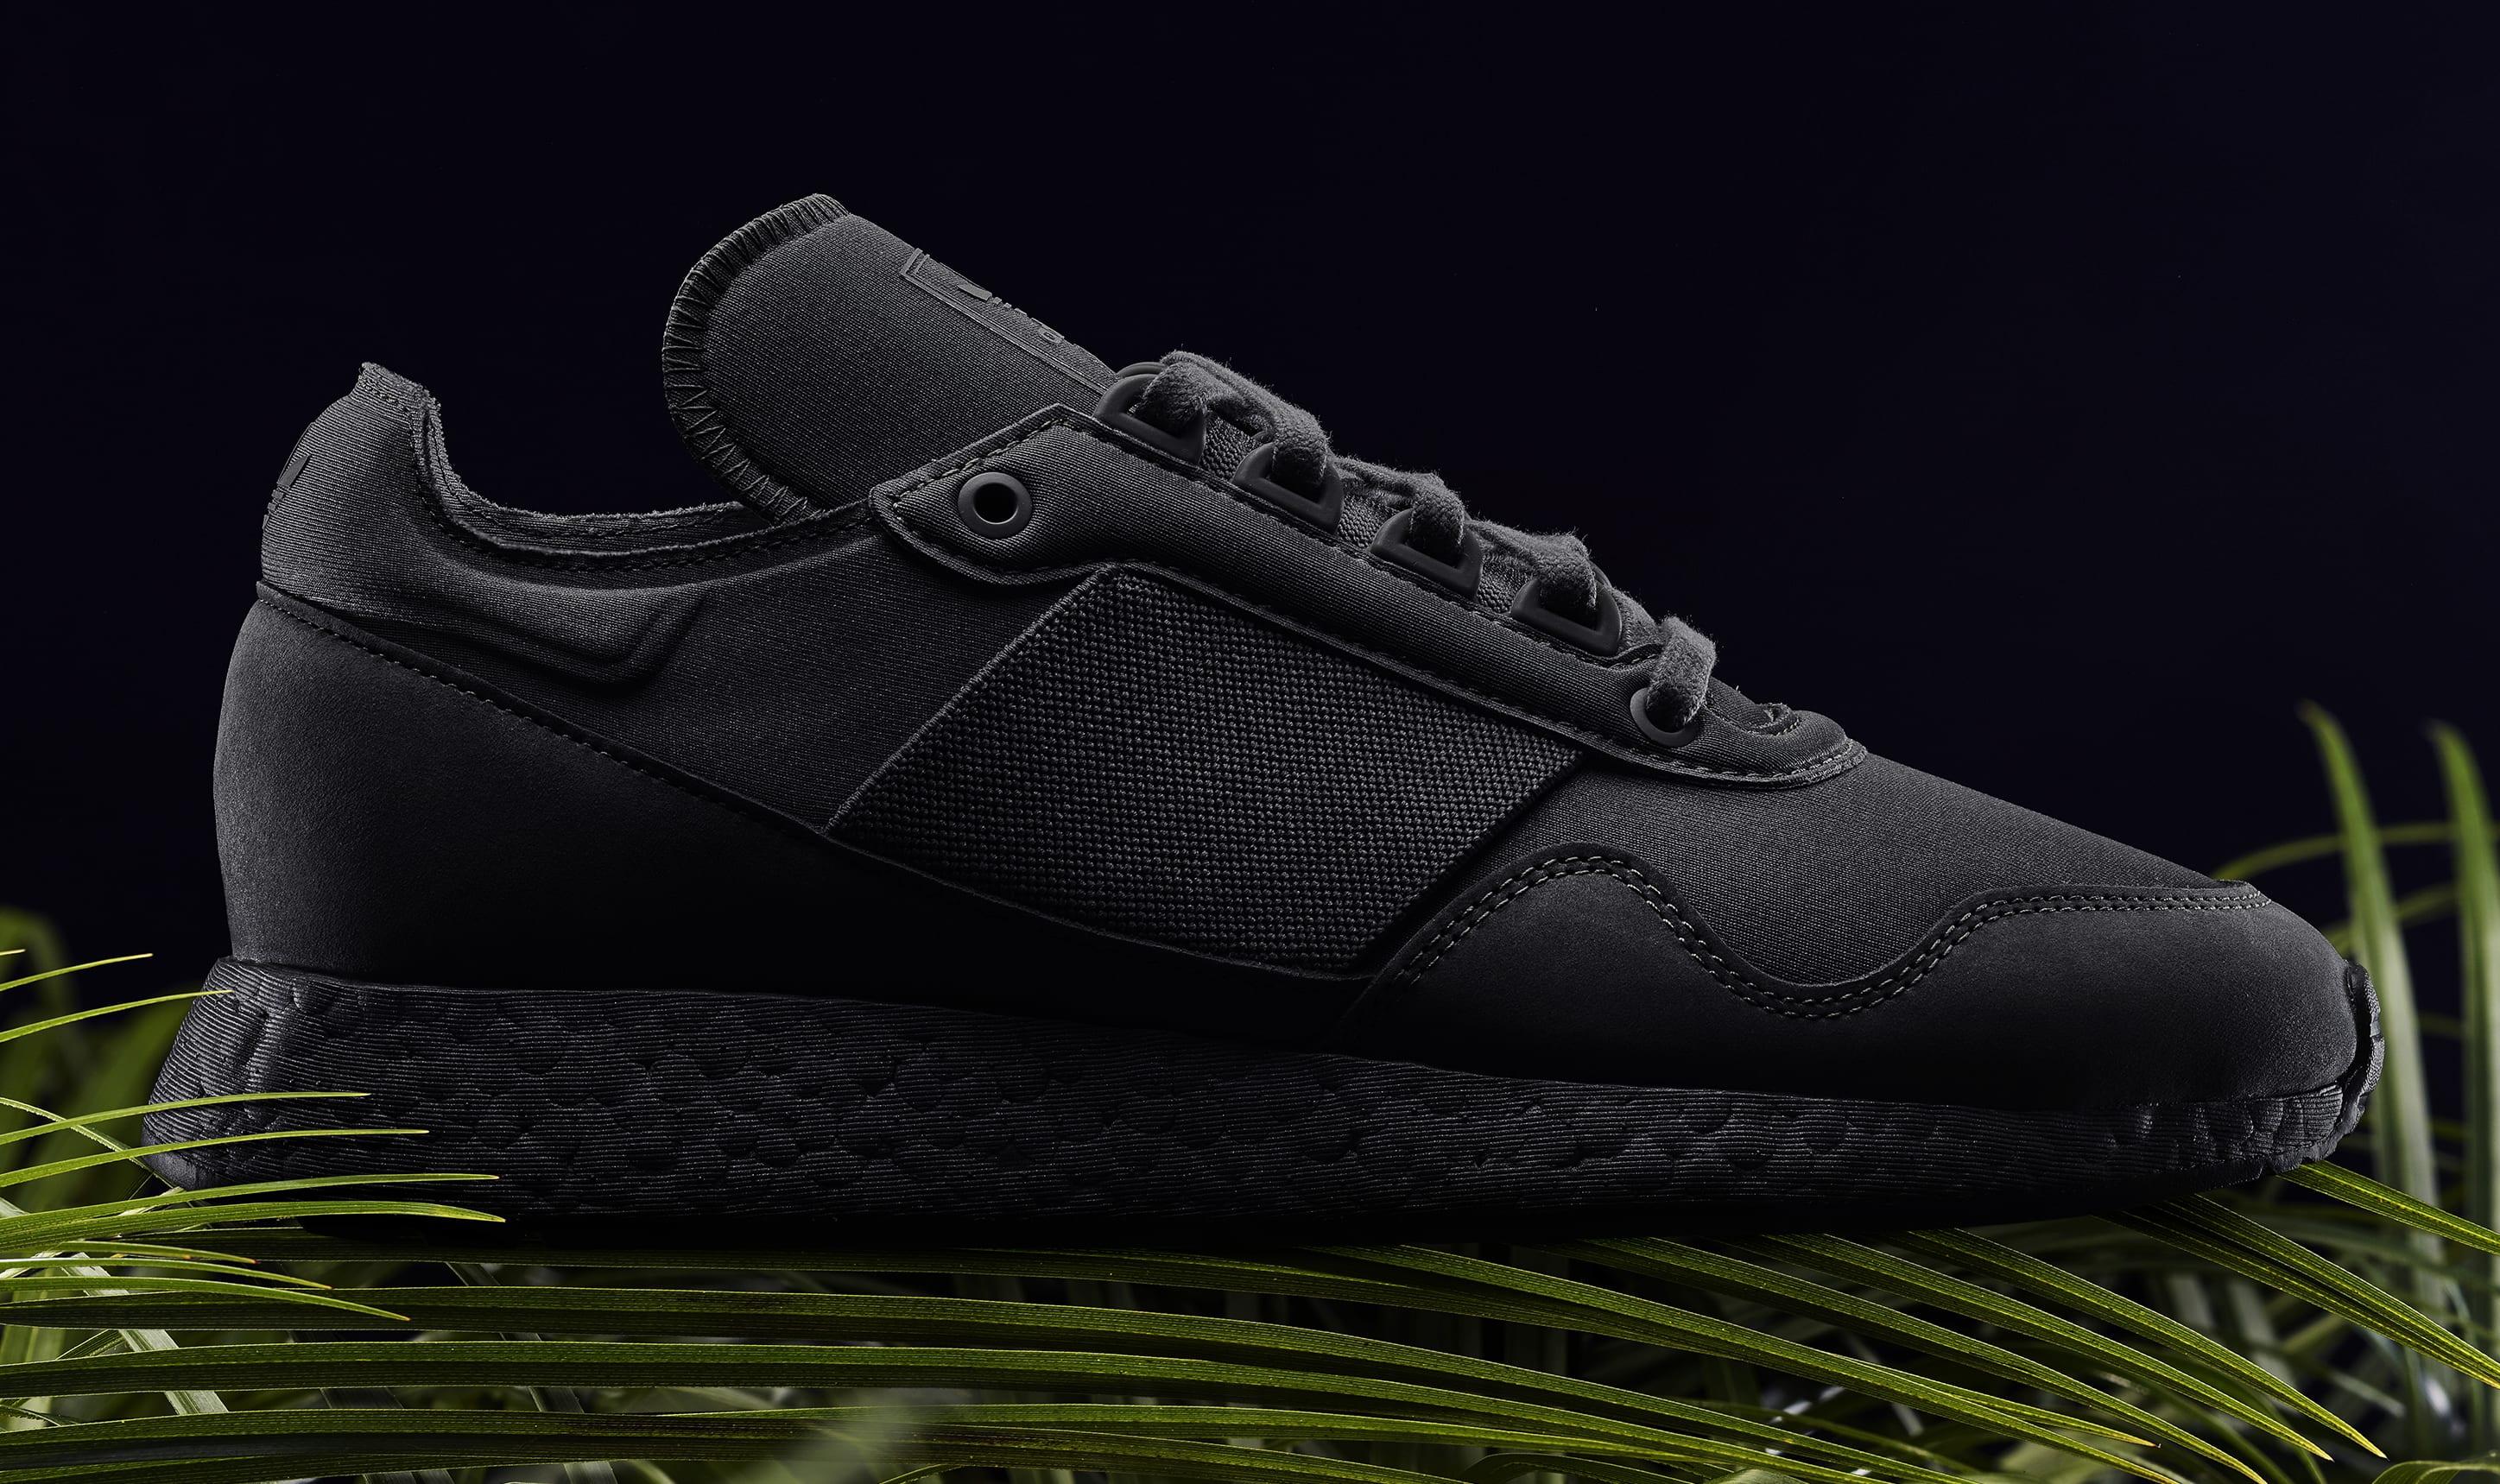 Daniel Arsham x Adidas New York Present DB1971 (Lateral)